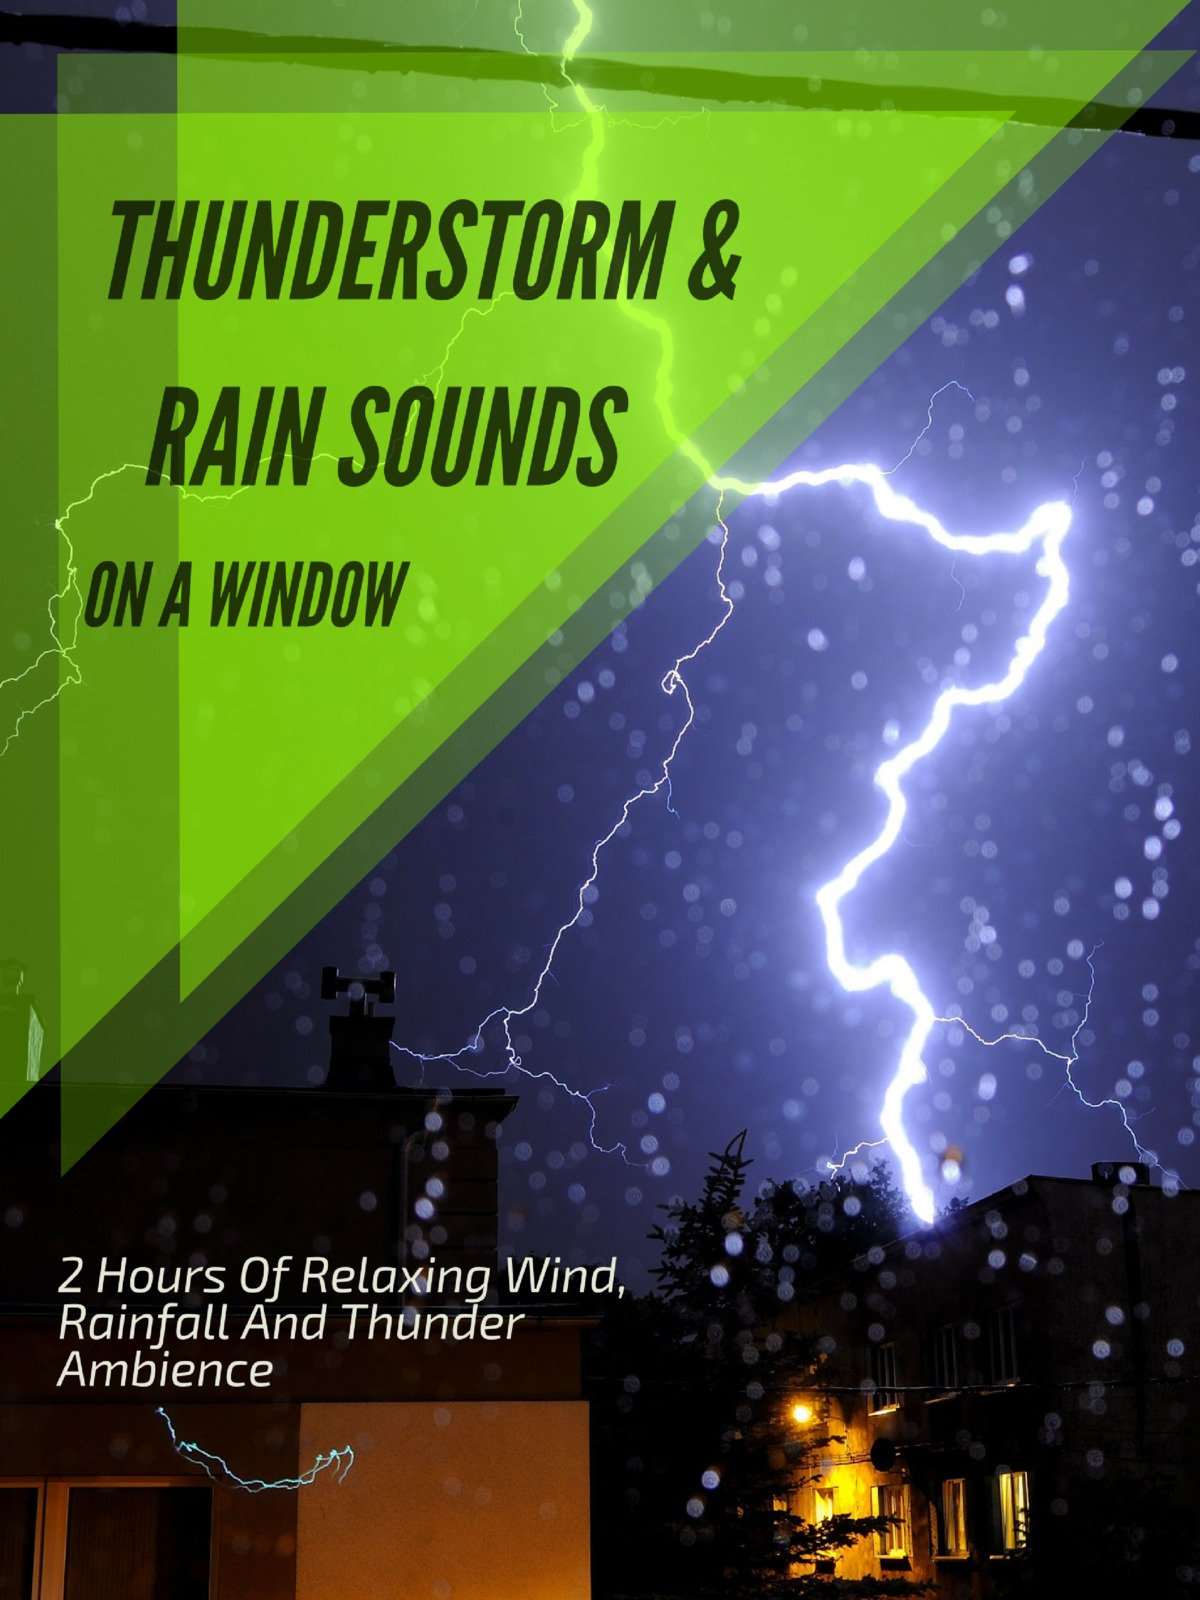 Thunderstorm & Rain Sounds on A Window on Amazon Prime Instant Video UK